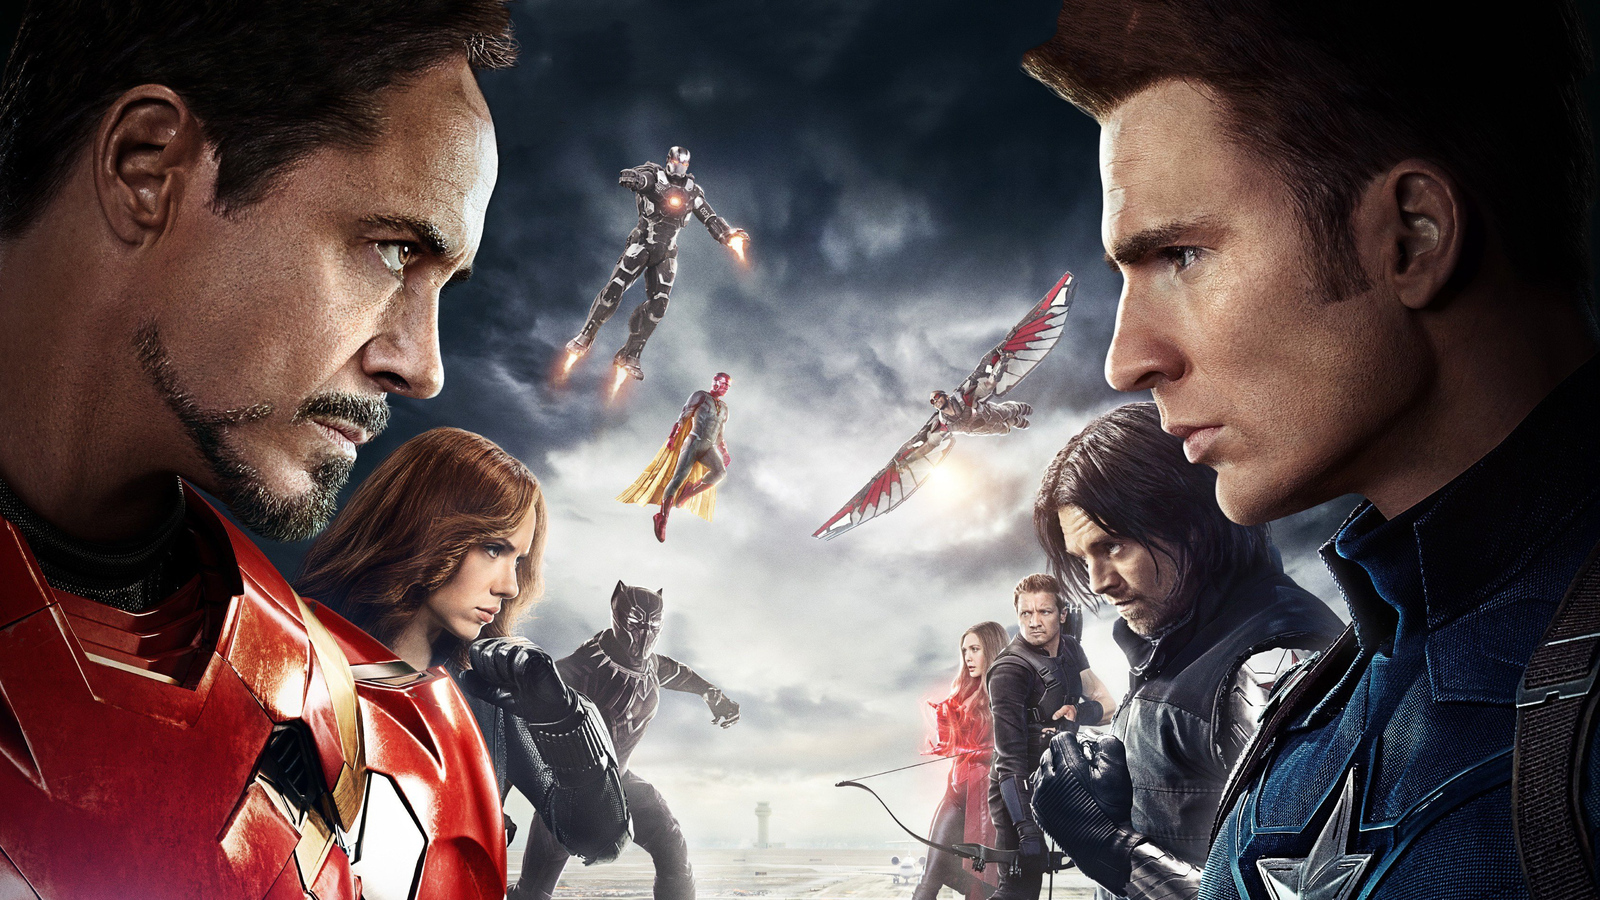 1600x900 Captain America Civil War Poster 1600x900 Resolution Hd